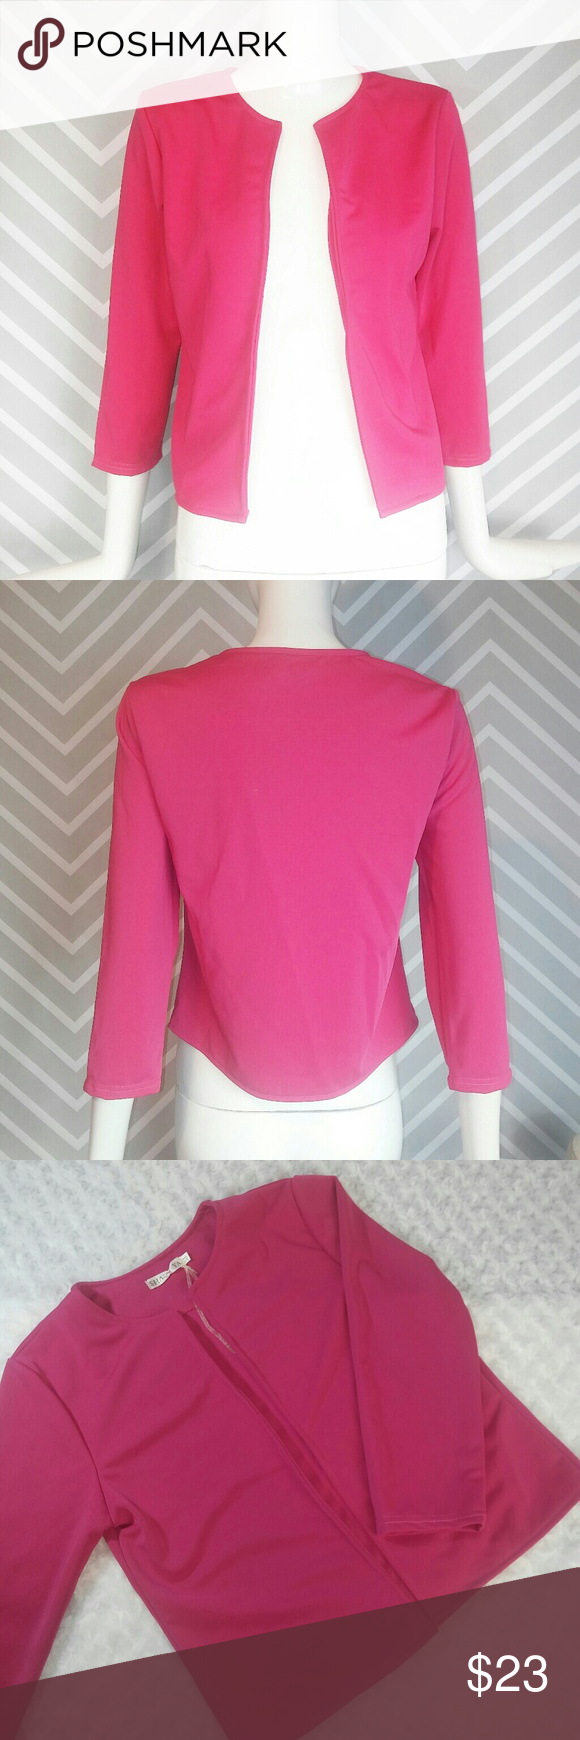 Hot Pink New Lightweight Blazer Top Throw Over Reasonable